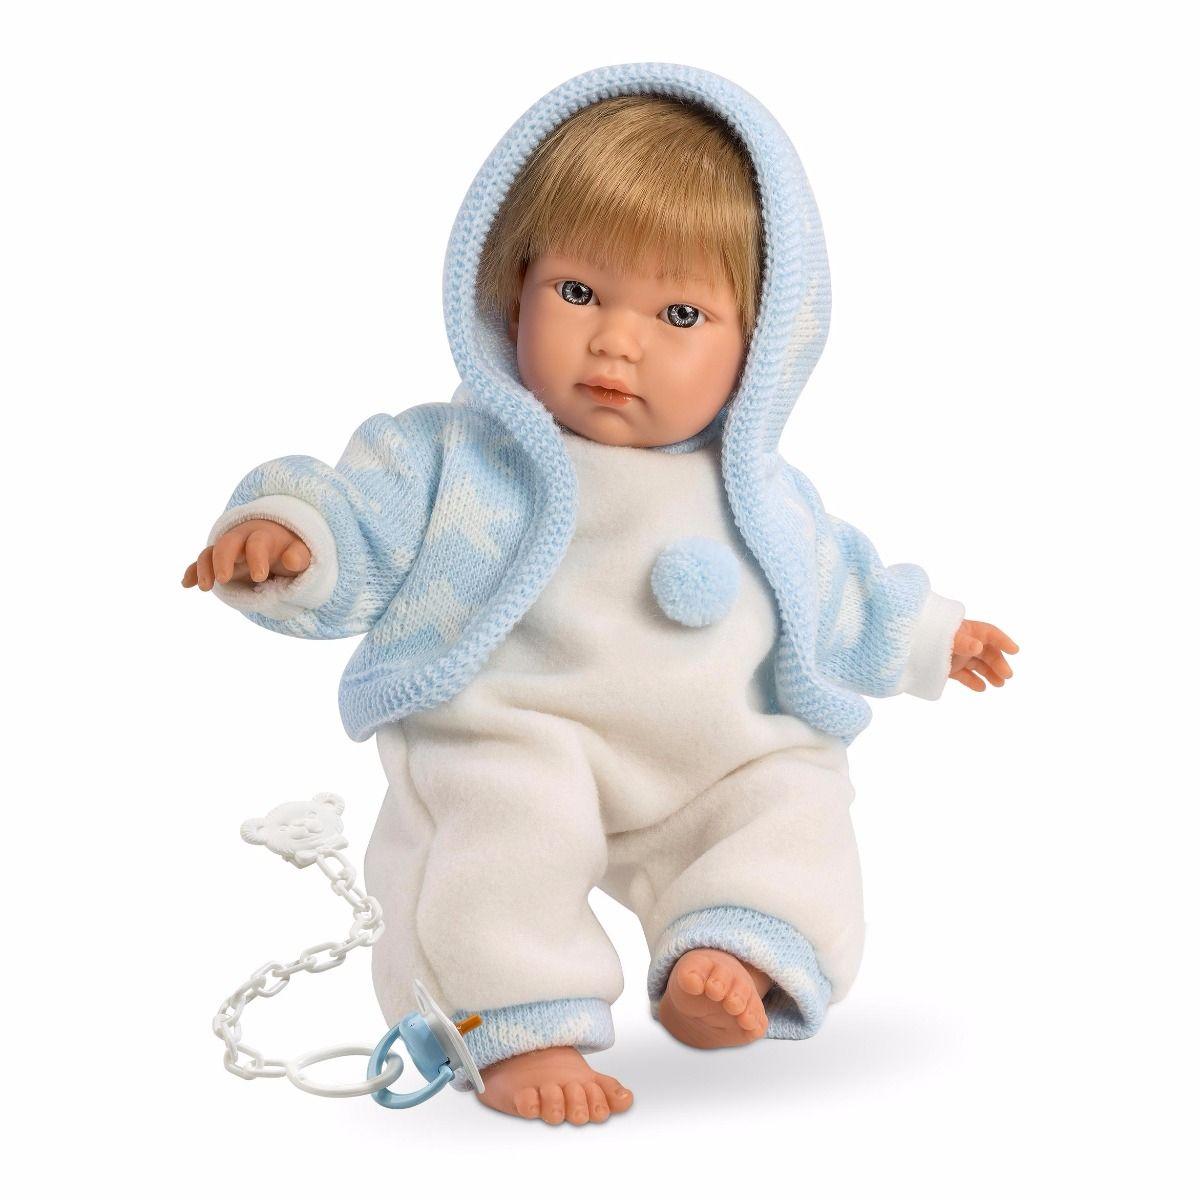 Кукла Кукуй, 30 смИспанские куклы Llorens Juan, S.L.<br>Кукла Кукуй, 30 см<br>